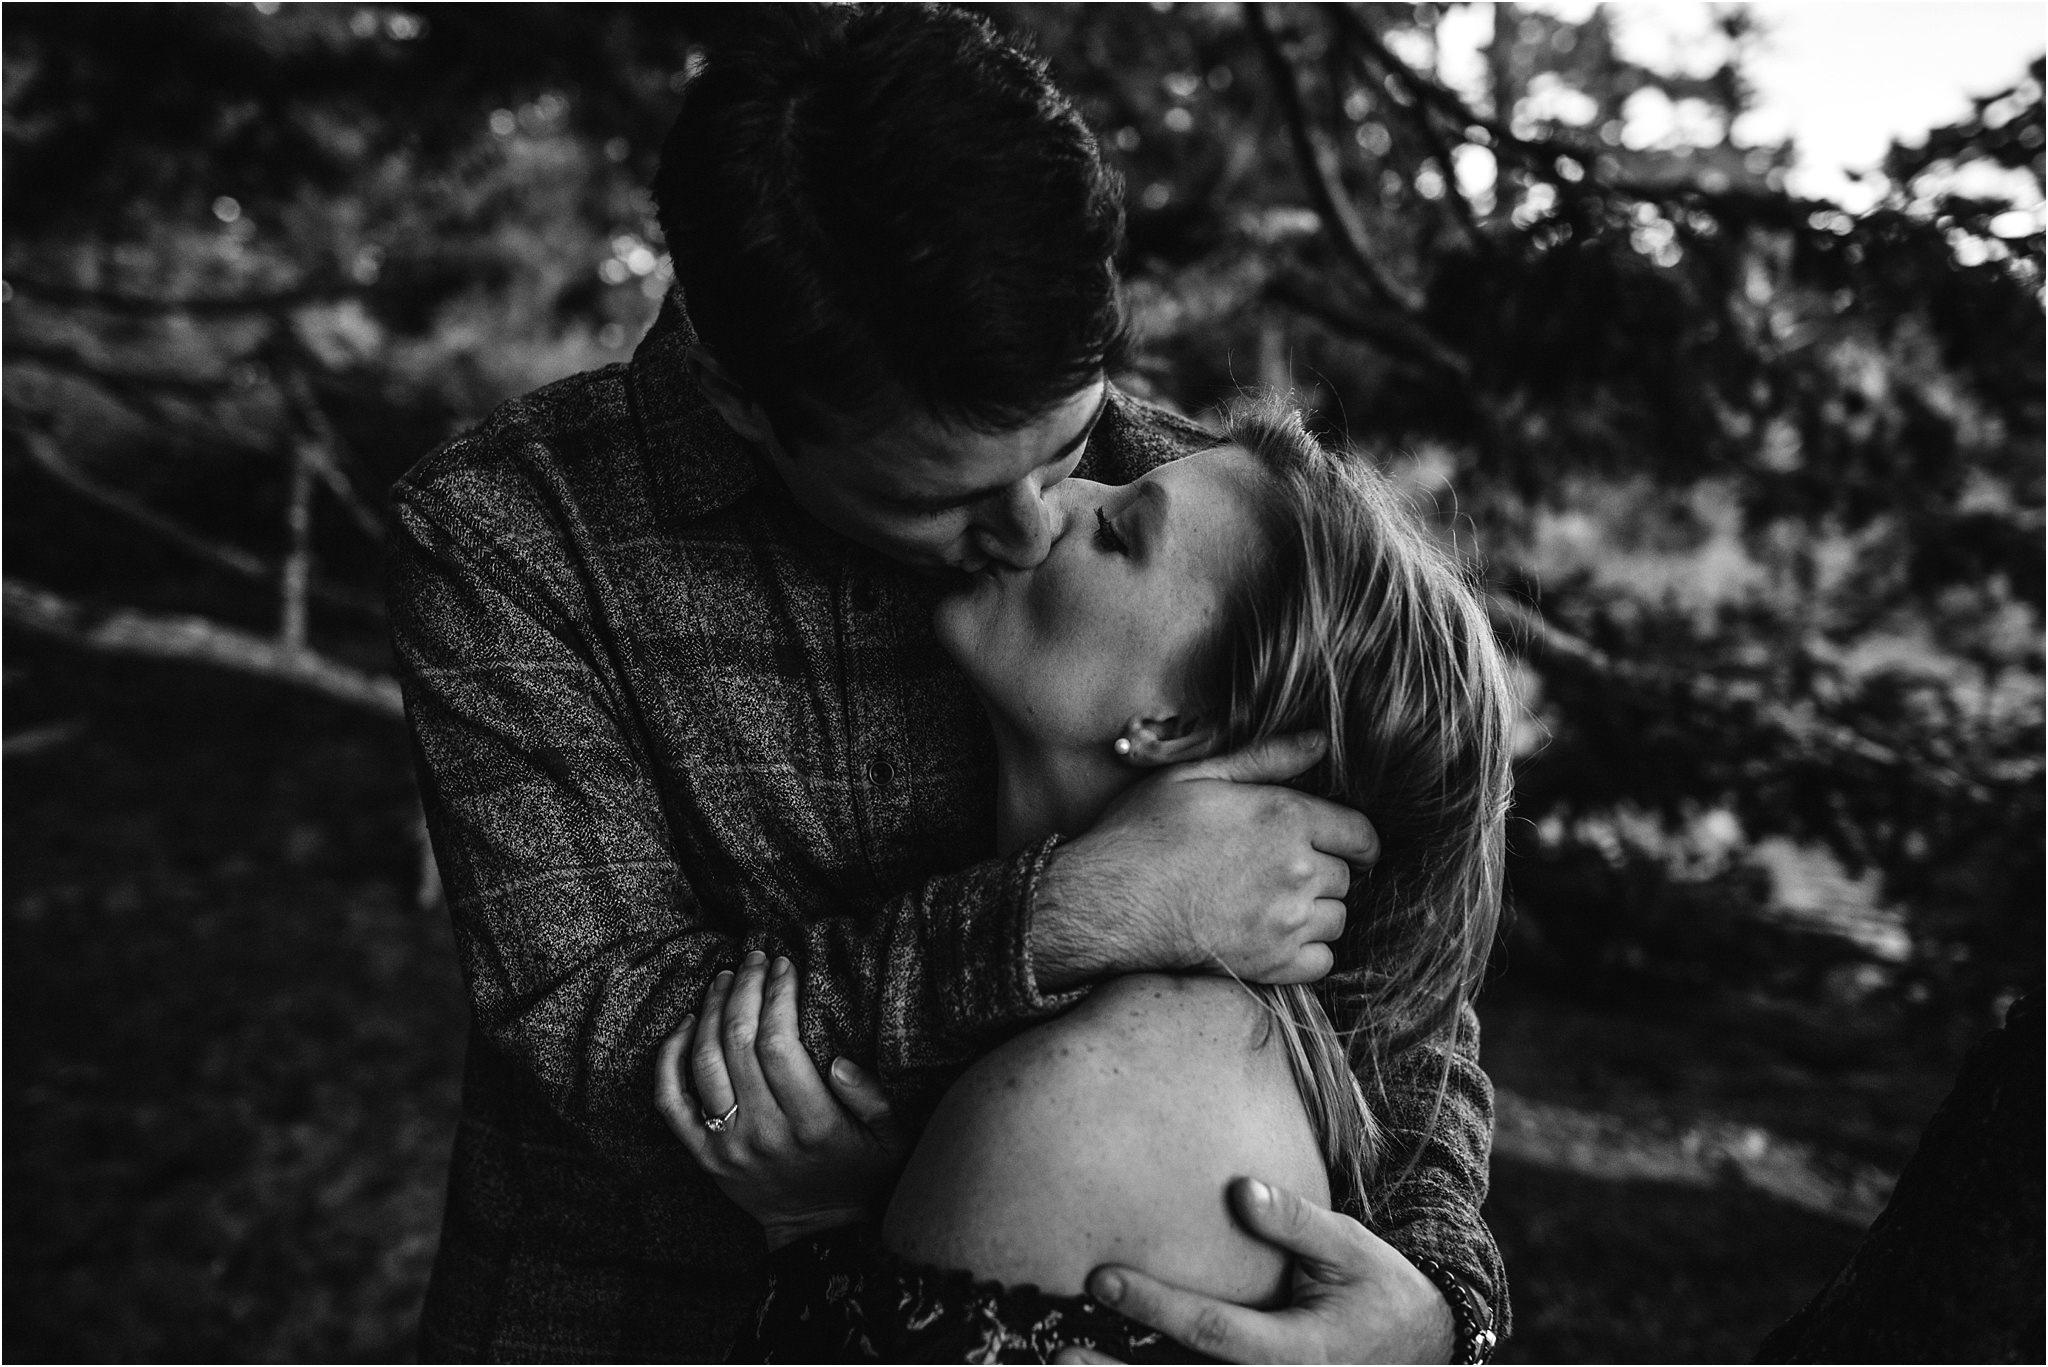 oak-harbor-couples-photographer-deception-pass-15.jpg